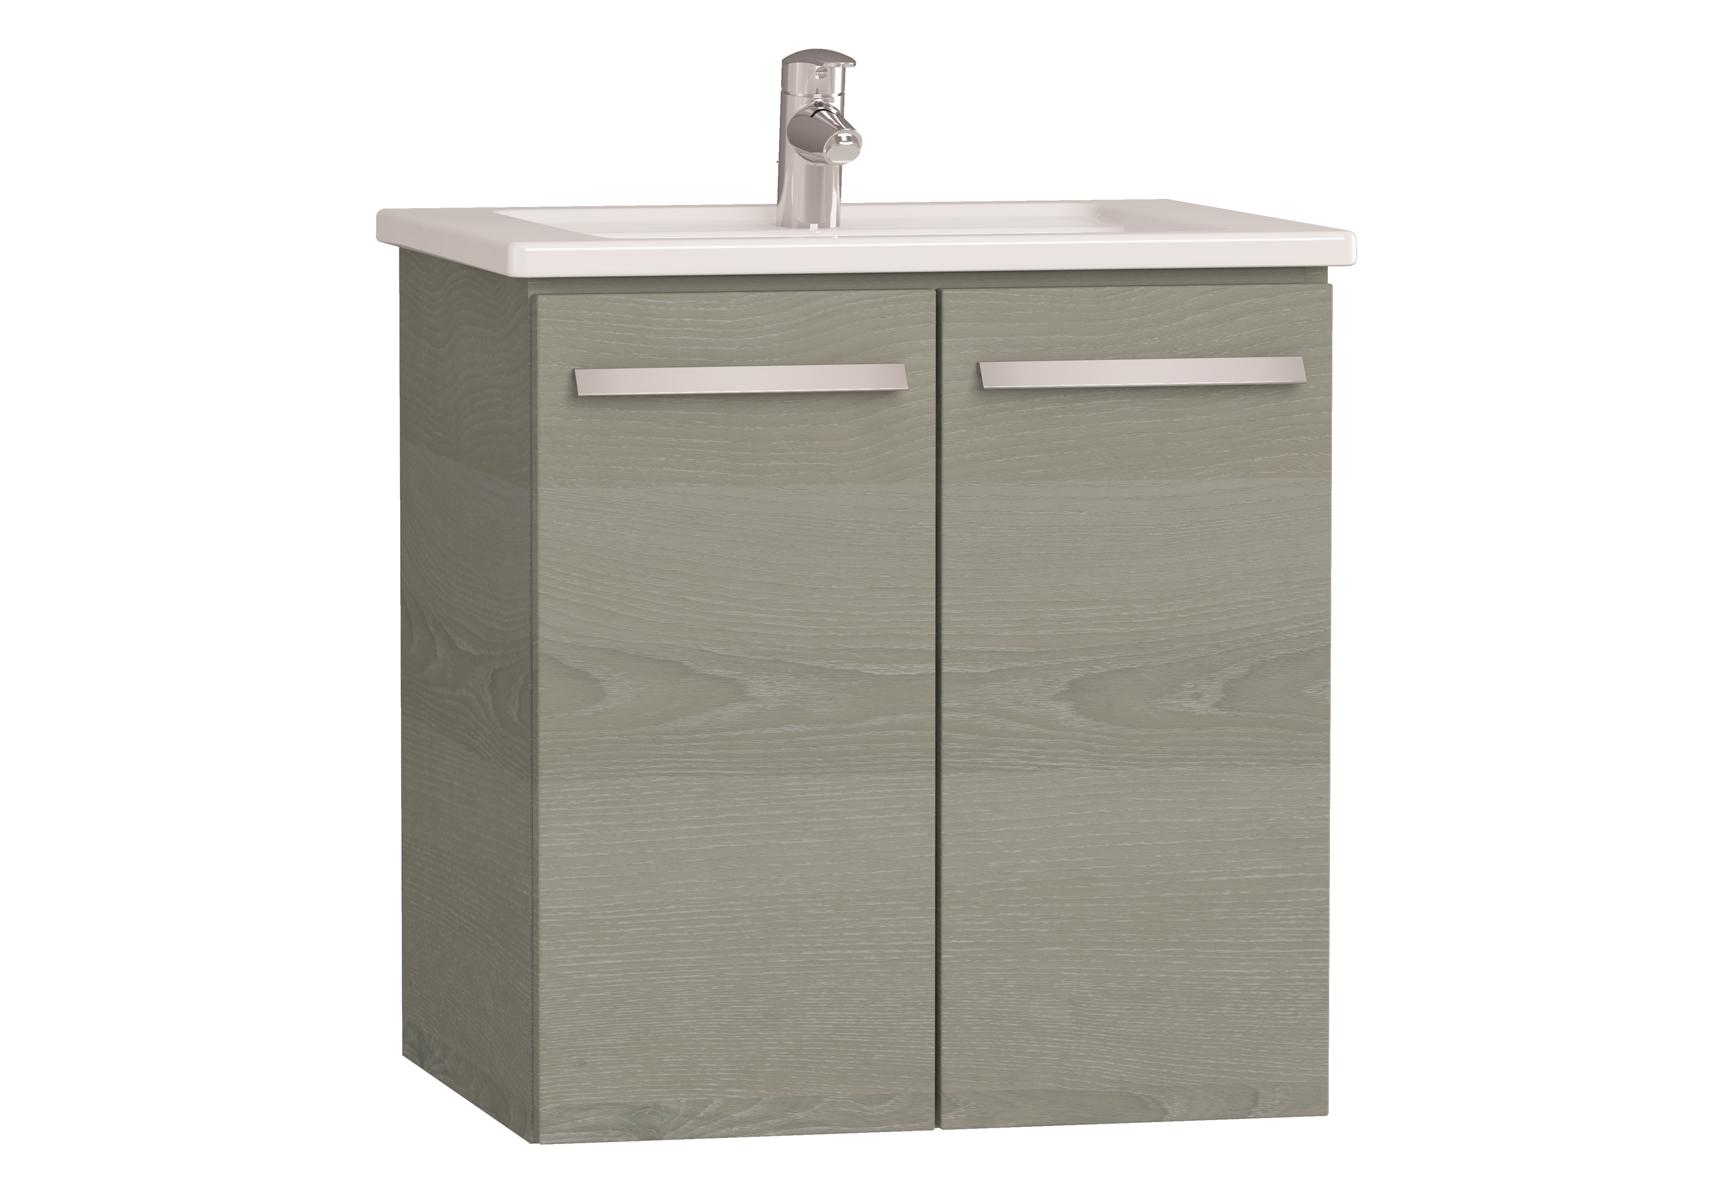 Integra meuble avec plan céramique avec portes, 60 cm, chêne gris naturel